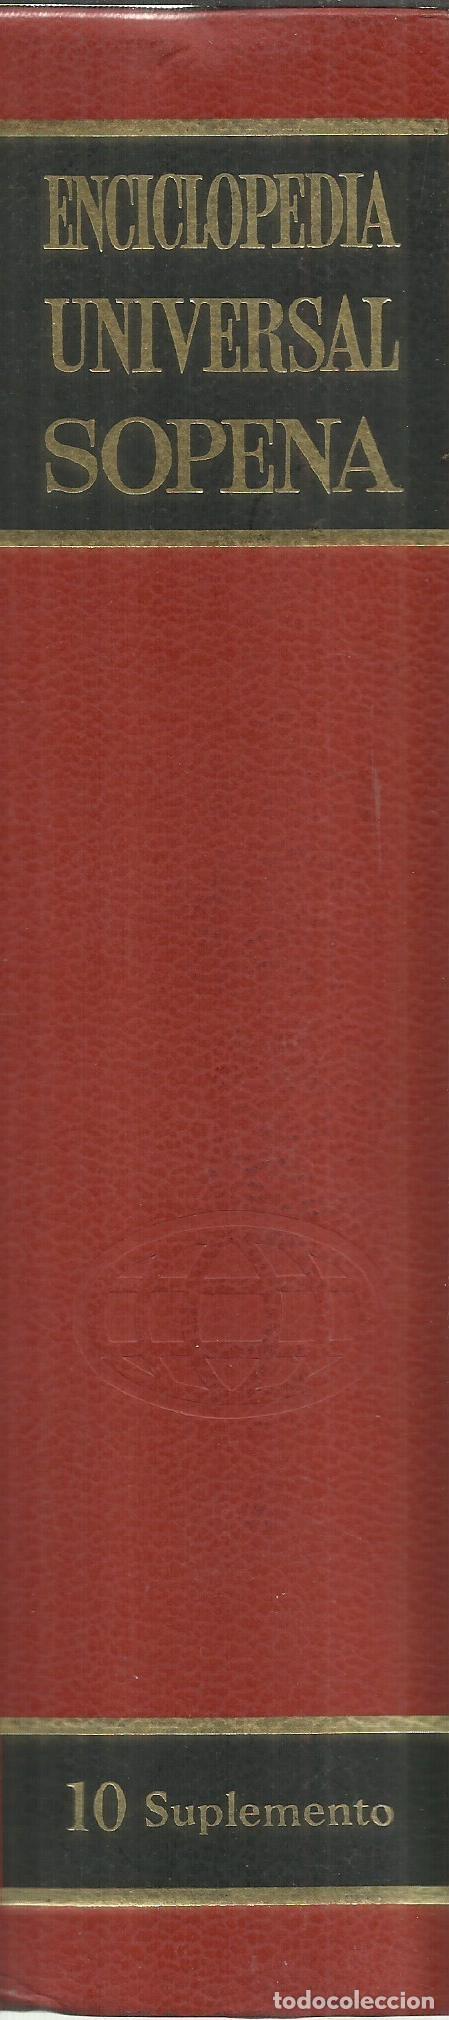 Libros de segunda mano: ENCICLOPEDIA UNIVERSAL SOPENA. TOMO 10. EDITORIAL RAMÓN SOPENA. BARCELONA. 1973 - Foto 2 - 74801015